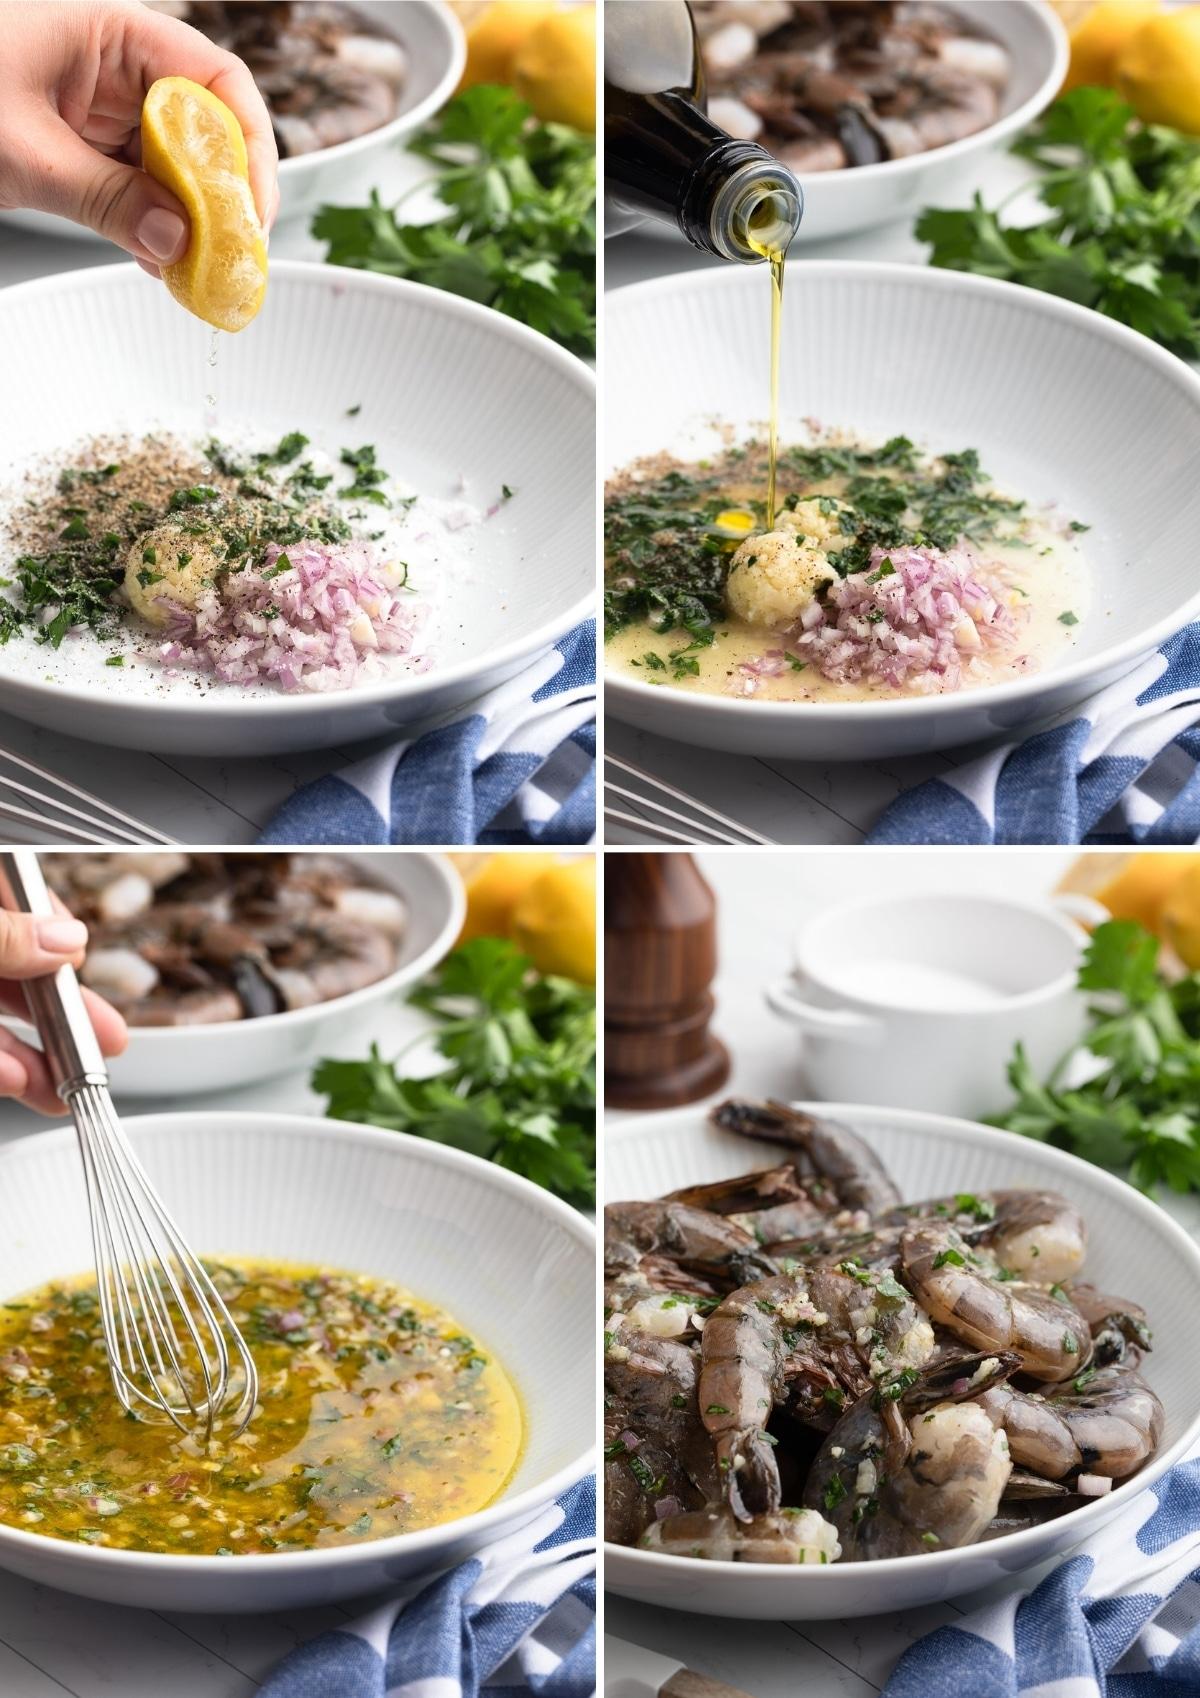 four photos showing the process of making lemon garlic shrimp marinade